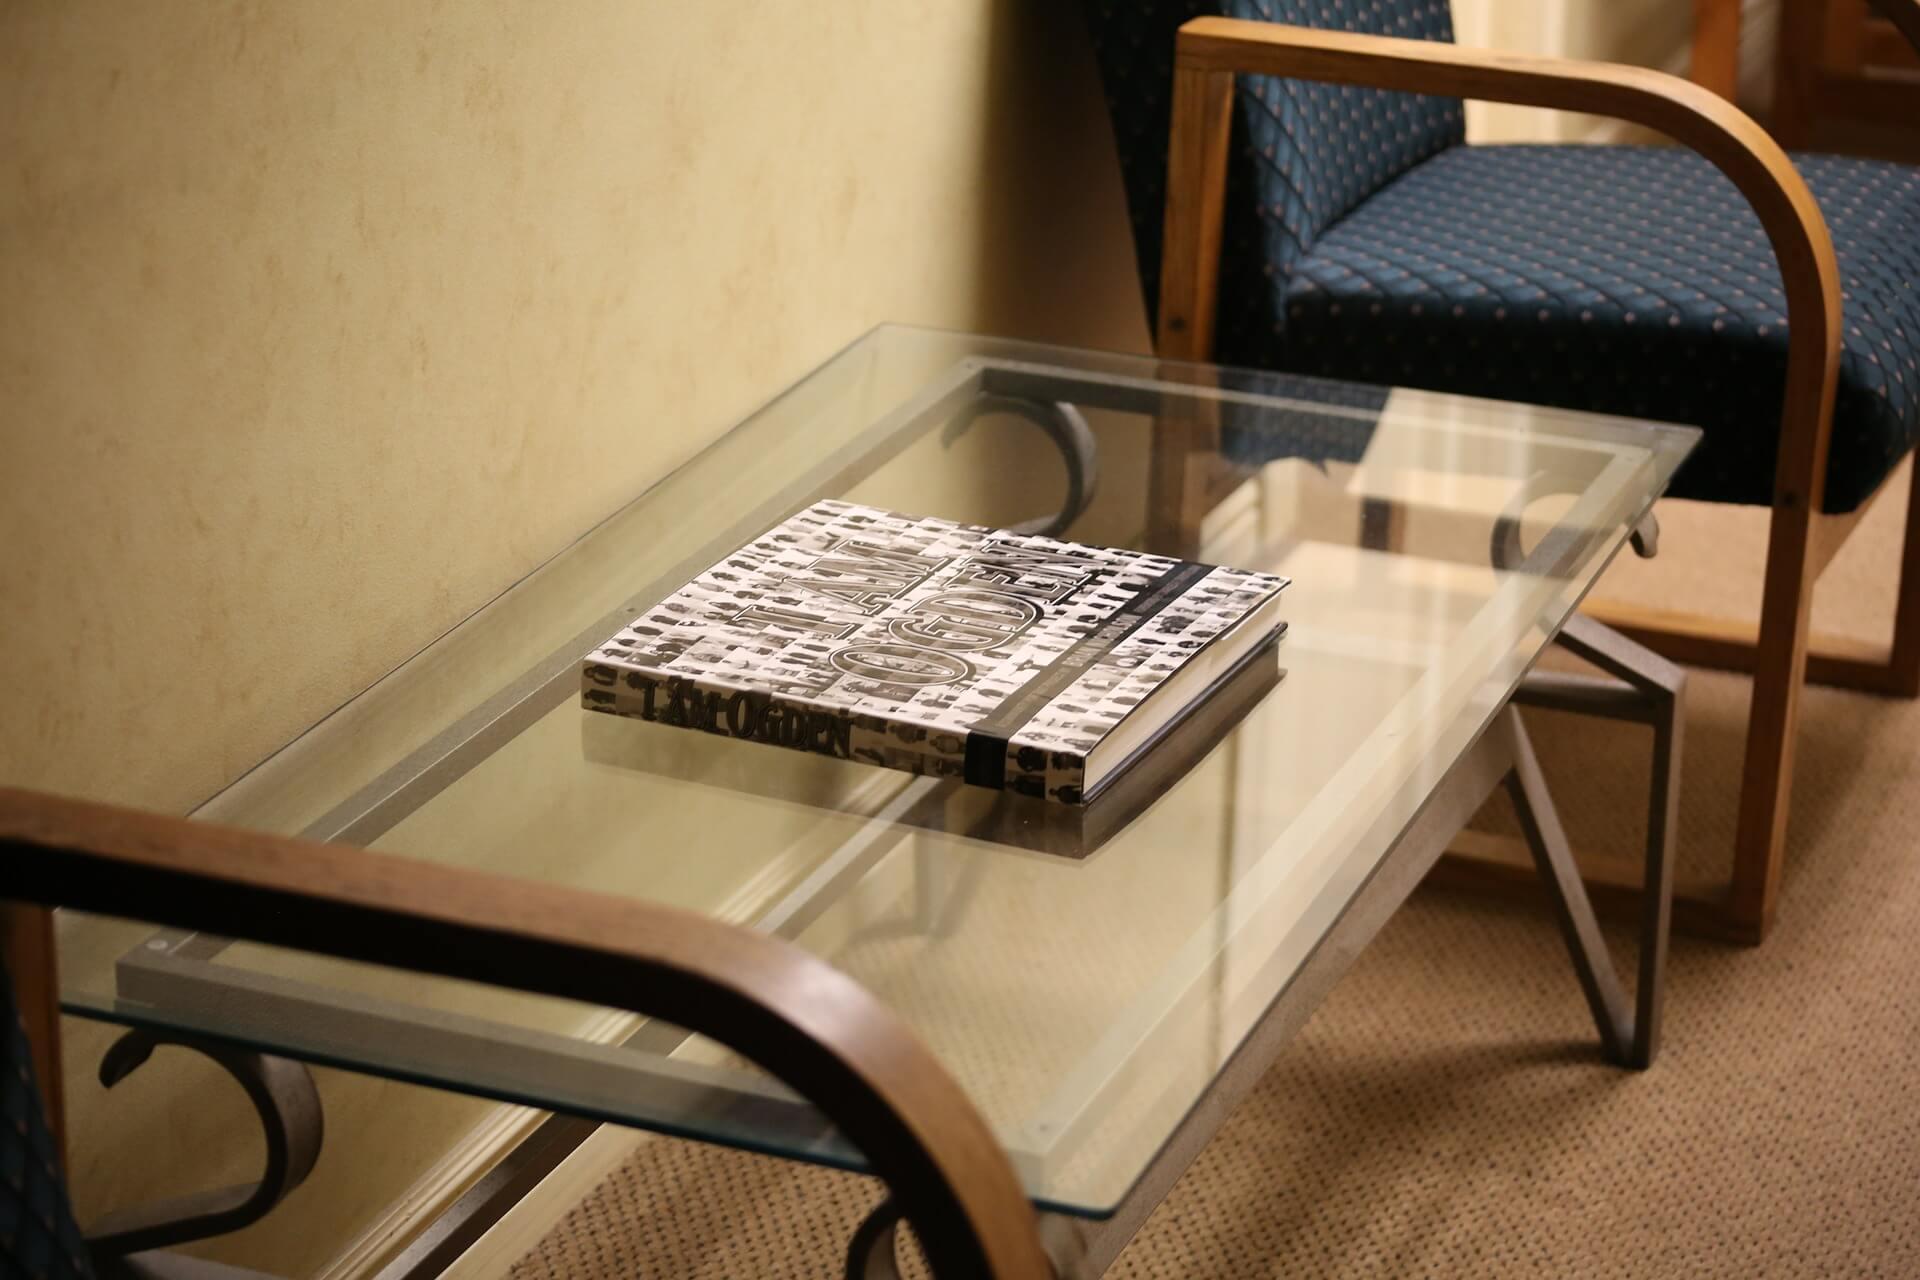 Furniture Design News interior design, design news and architecture trends